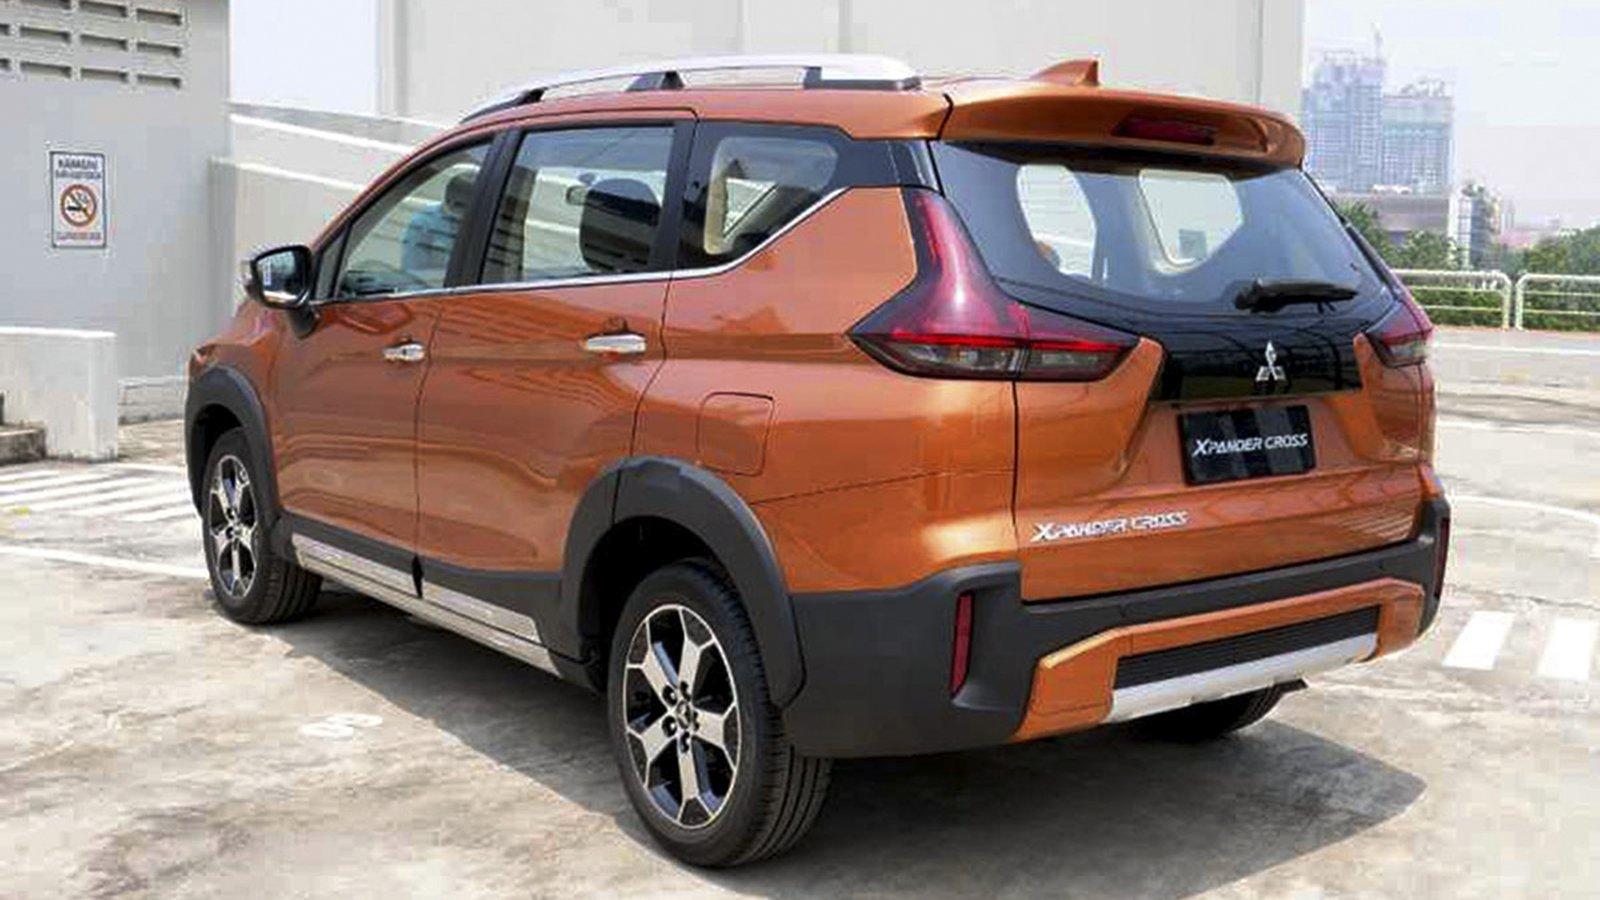 Ảnh Đuôi xe Mitsubishi Xpander Cross 2020